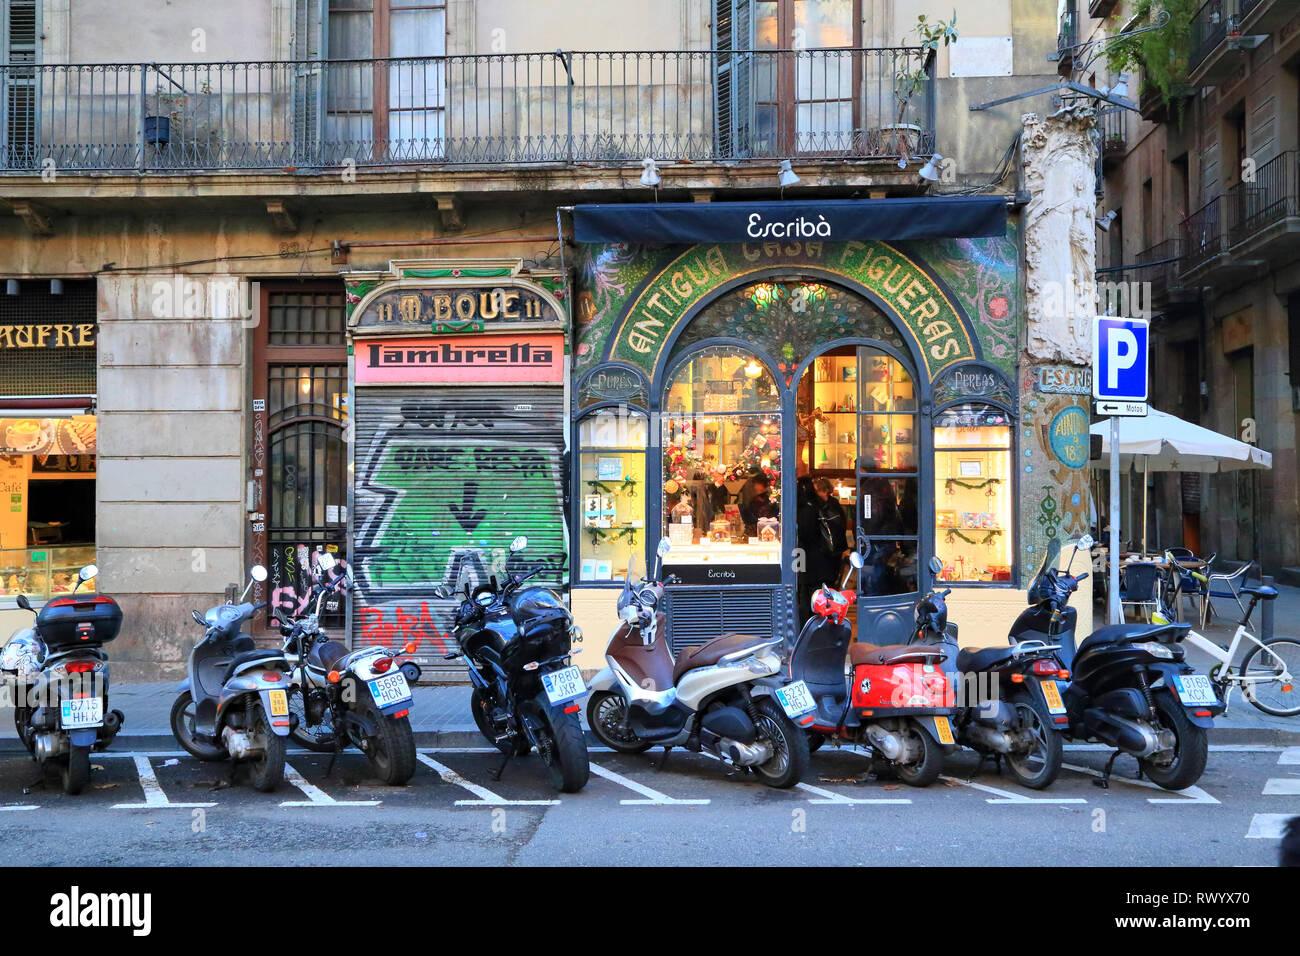 Adresse schokoladenhersteller, La Rambla, Barcelona Stockbild